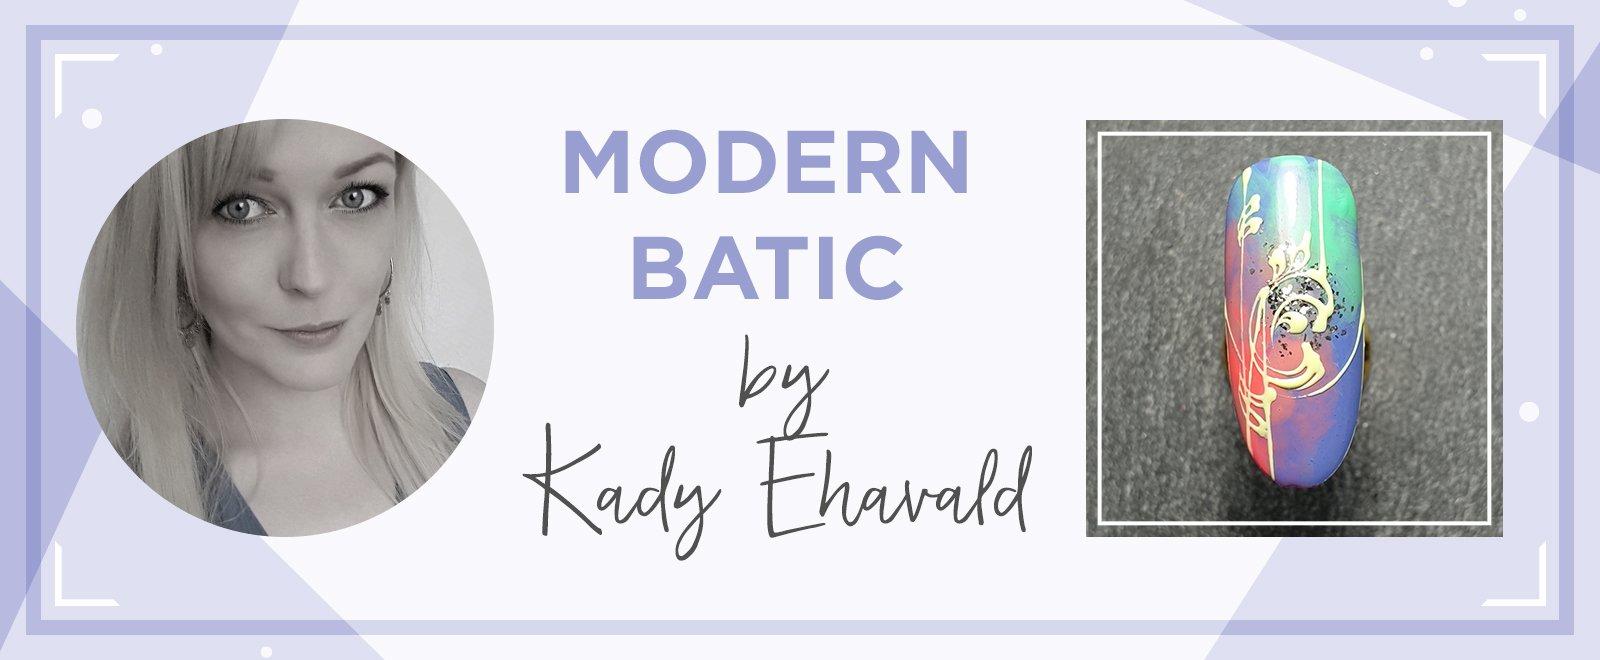 SBS_header_template_1600x660_modern-batic_Kady-Ehavald